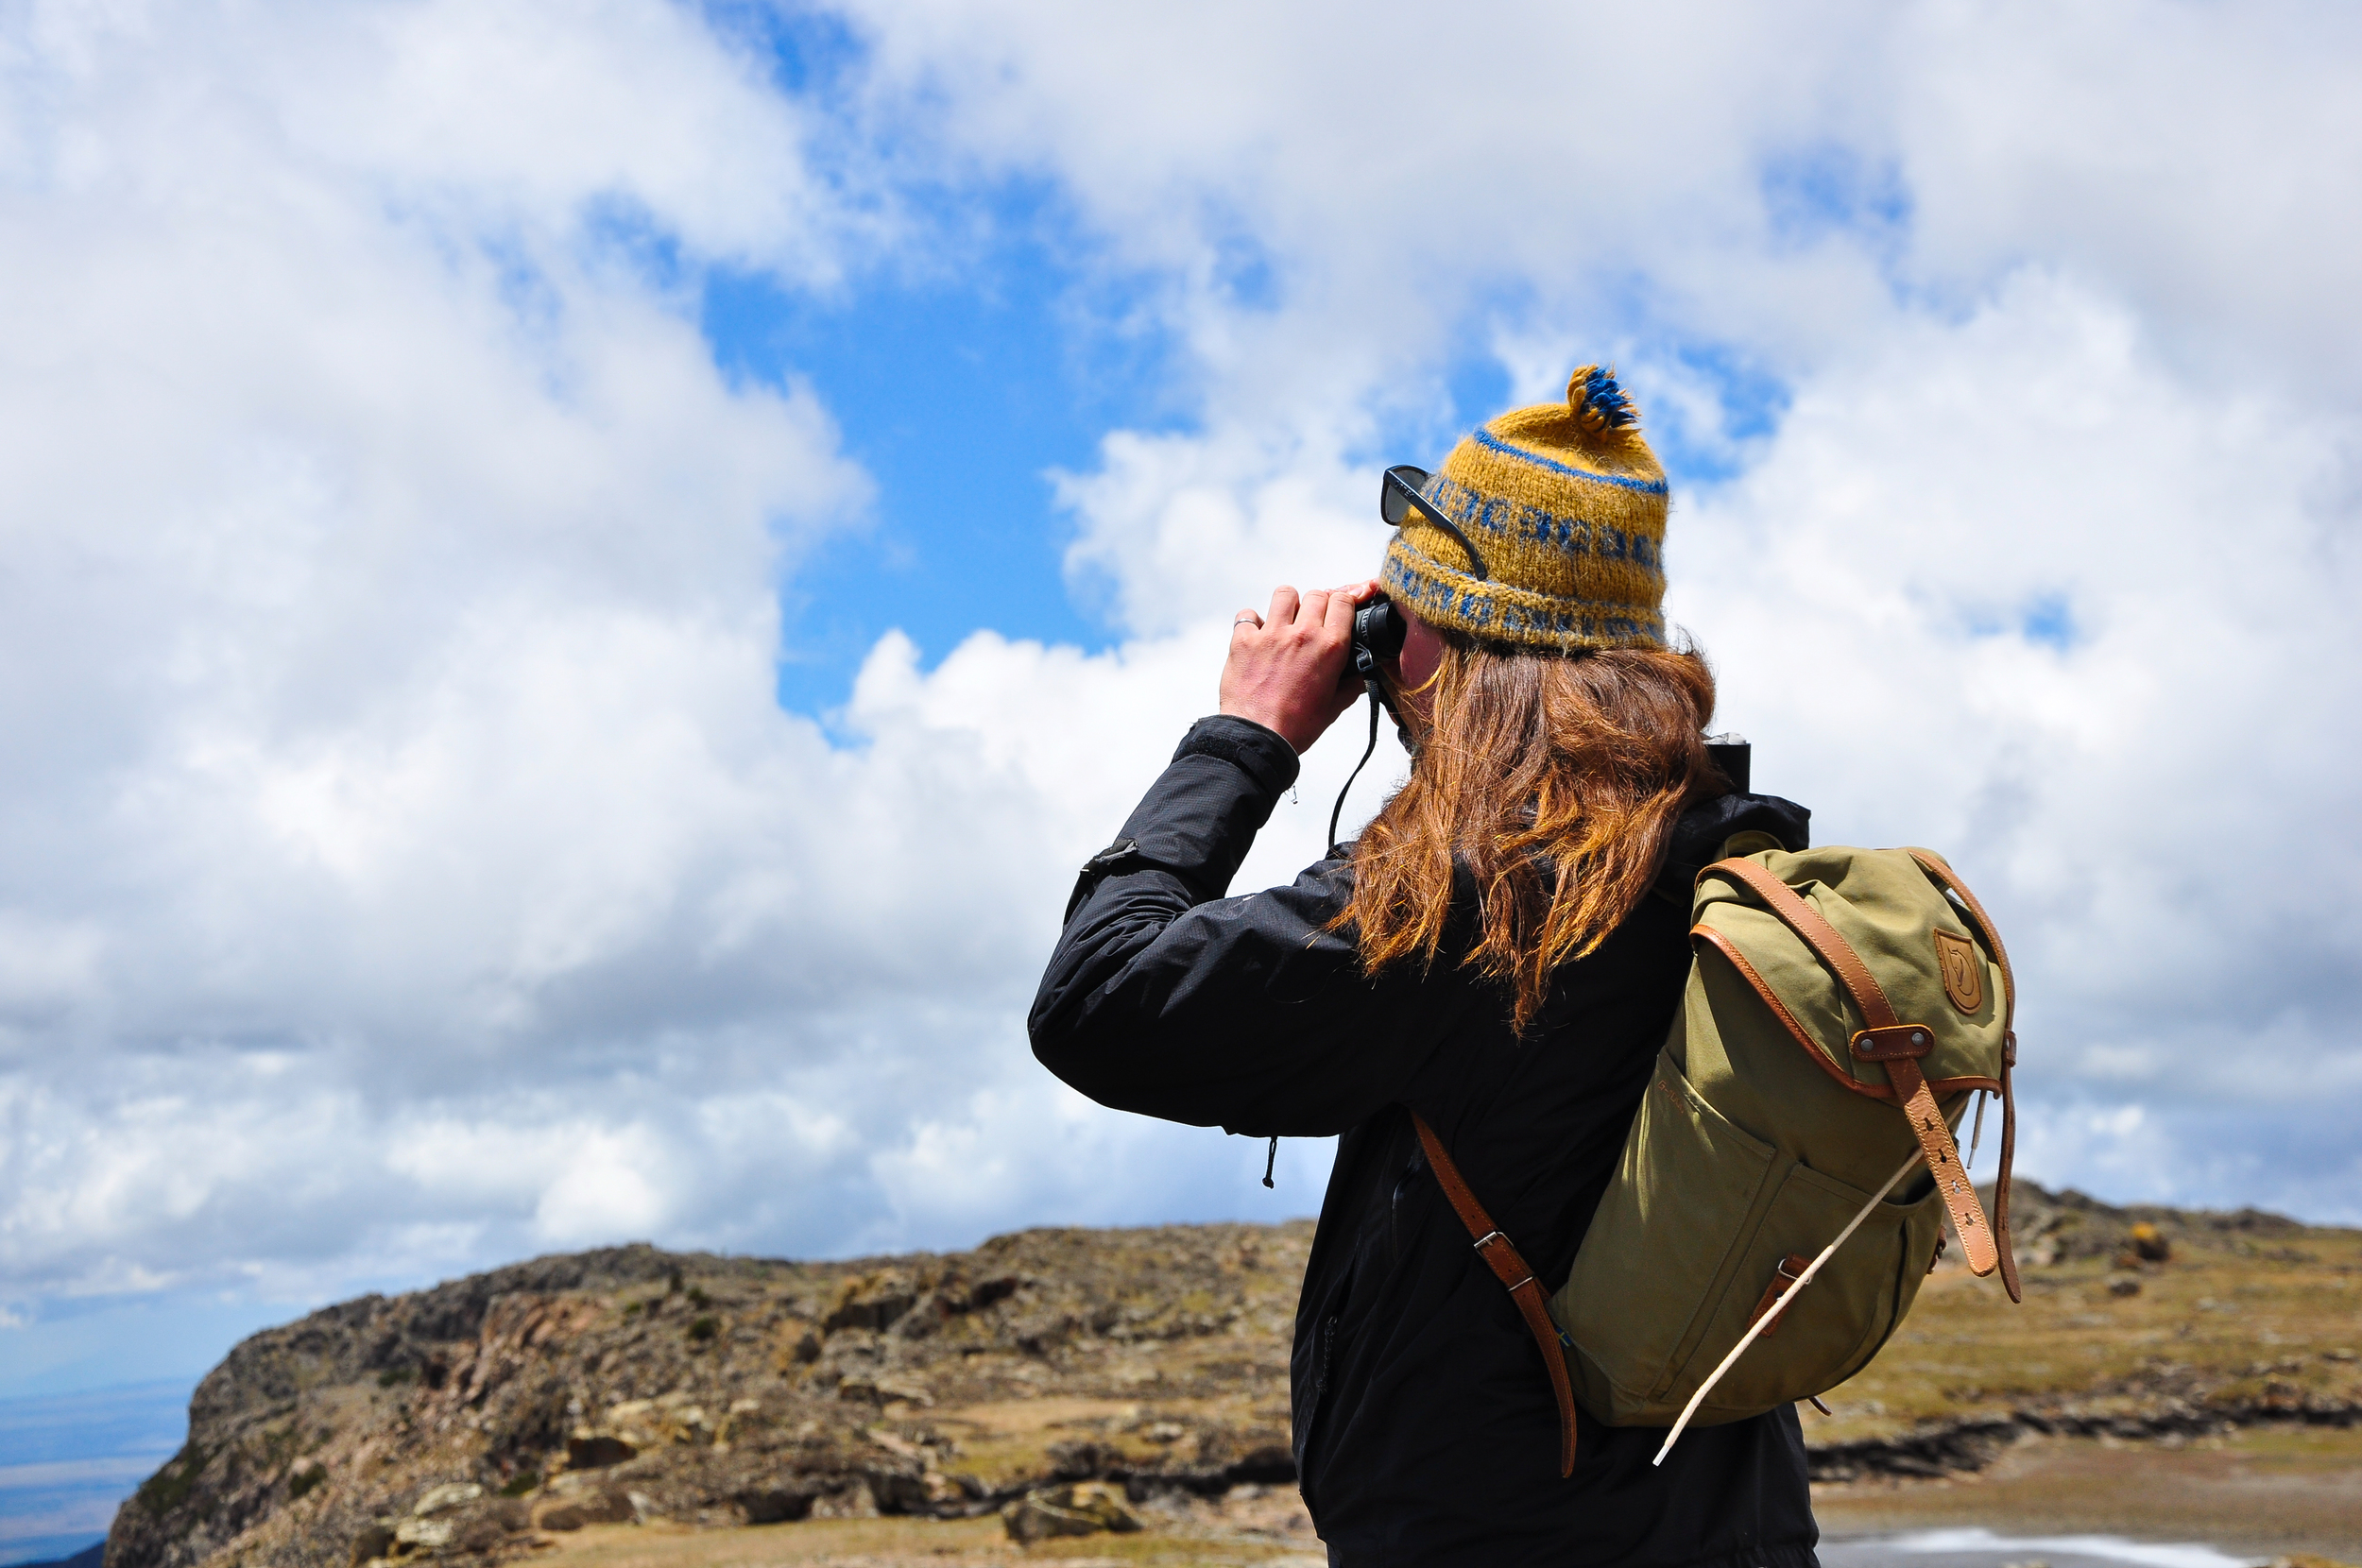 Adventure waits, just around the bend - Sanetti Plateau, Bale Mountains, Ethiopia